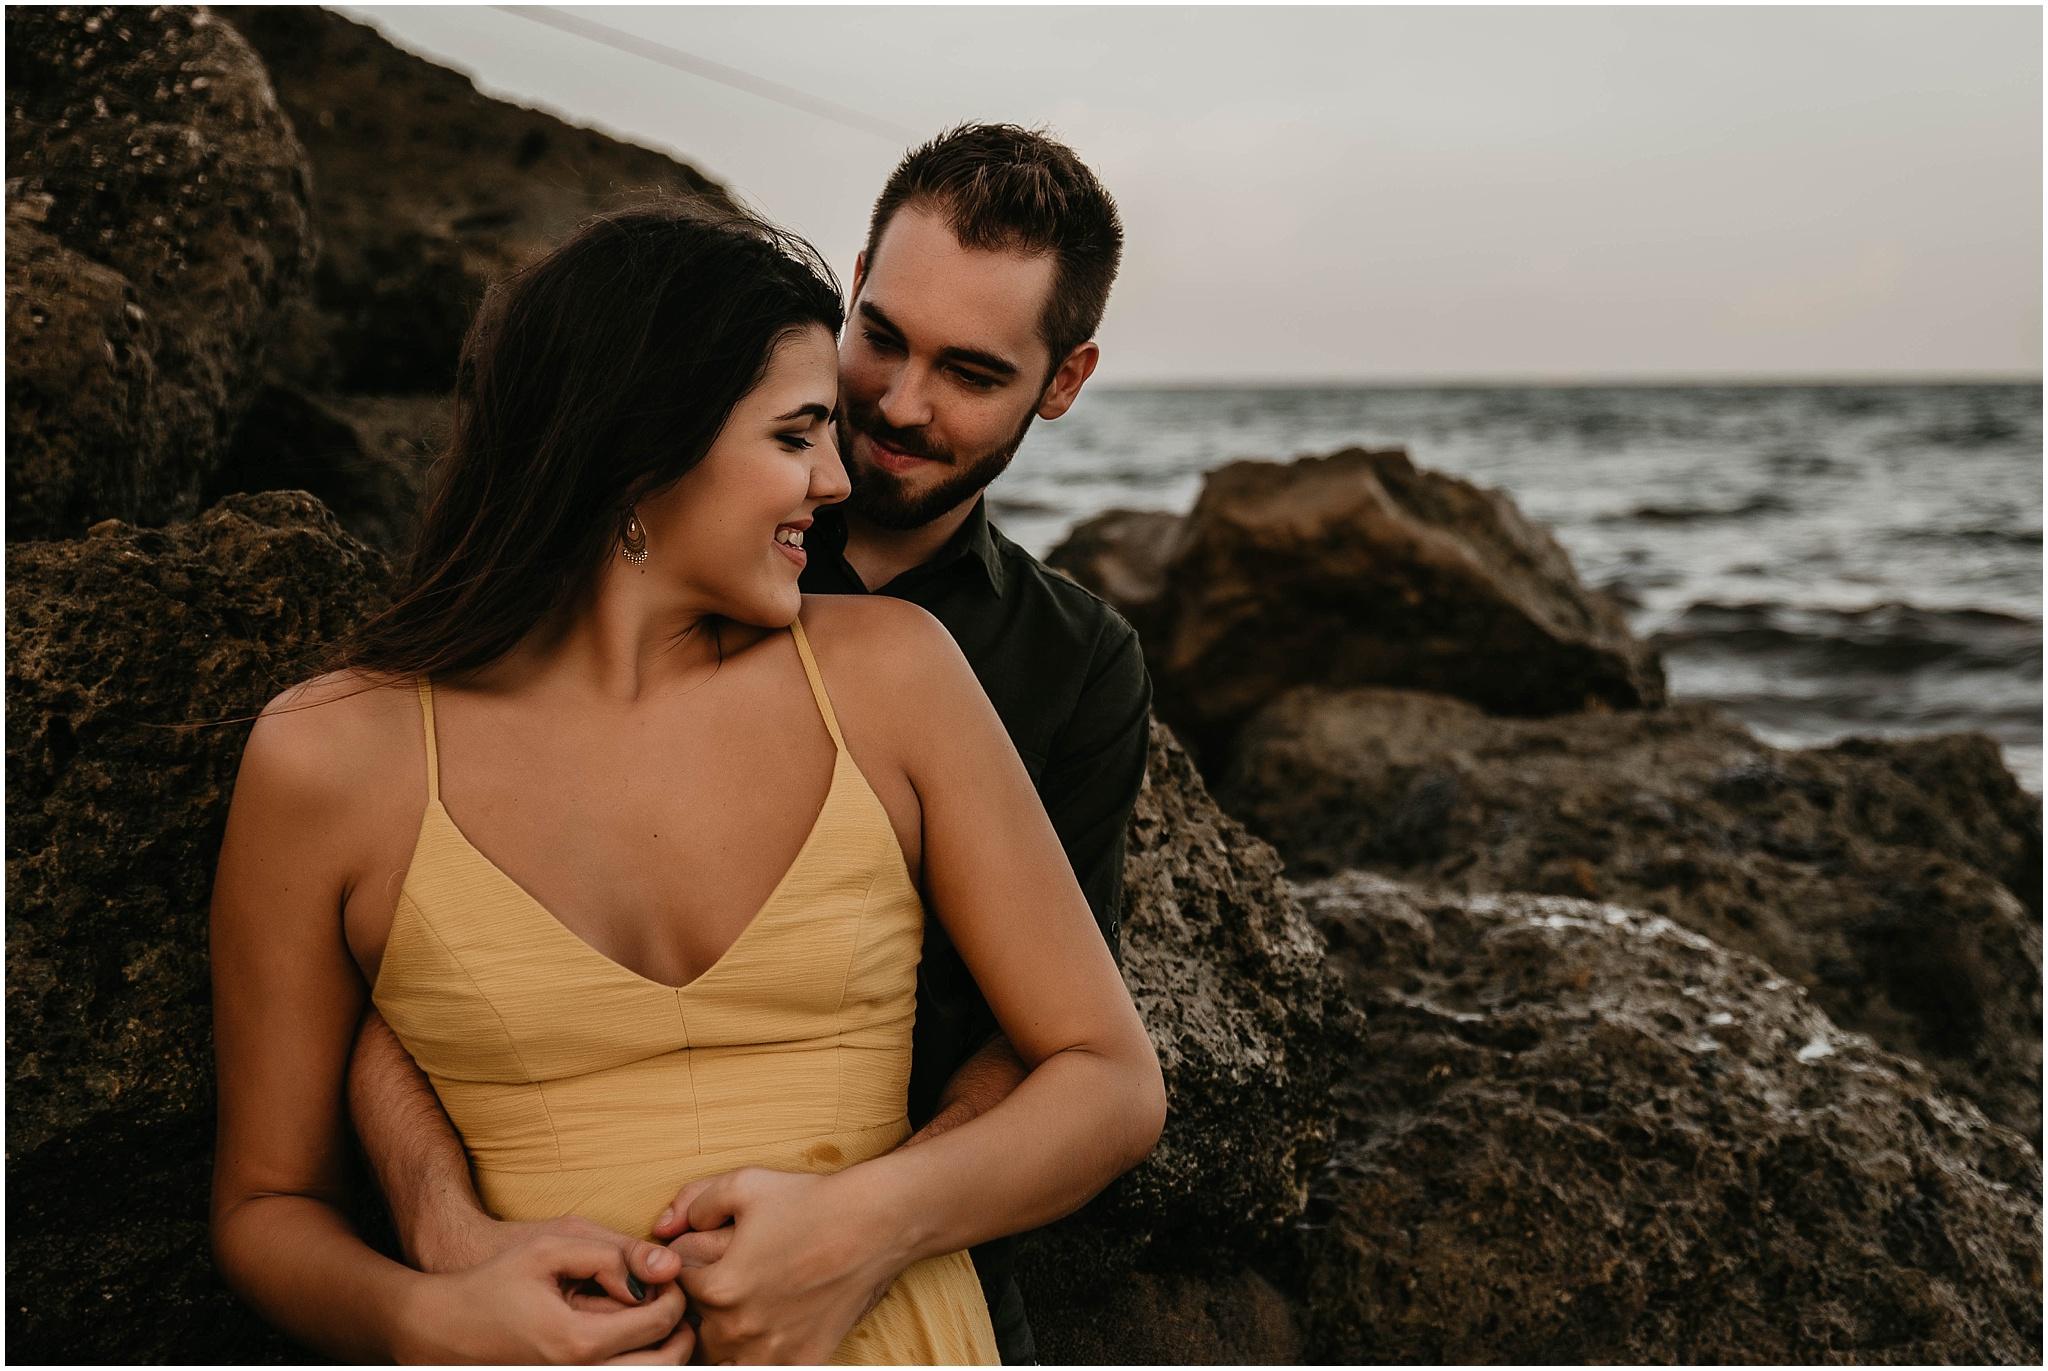 Worth-Avenue-Palm-Beach-engagement-photographer_0020.jpg